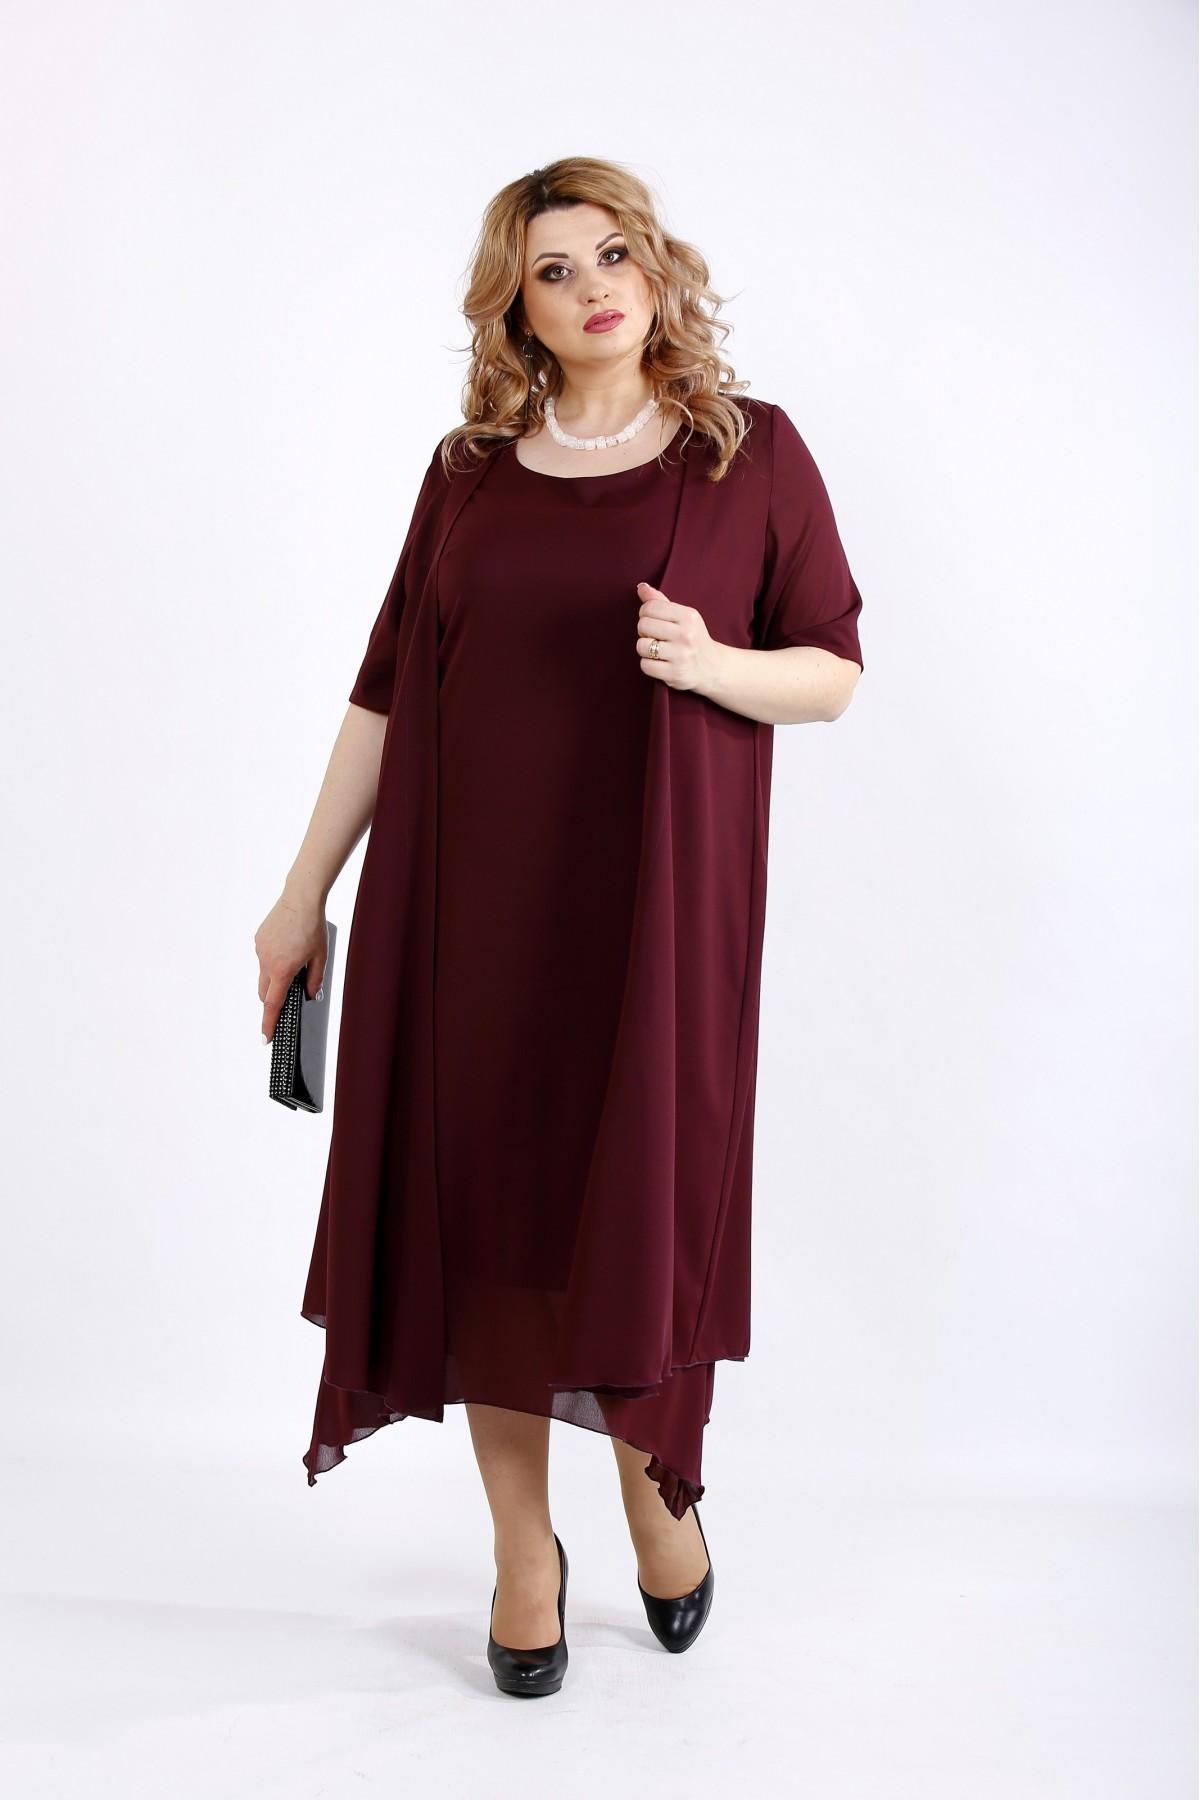 01119-2 | Костюм из креп шифона: платье и накидка